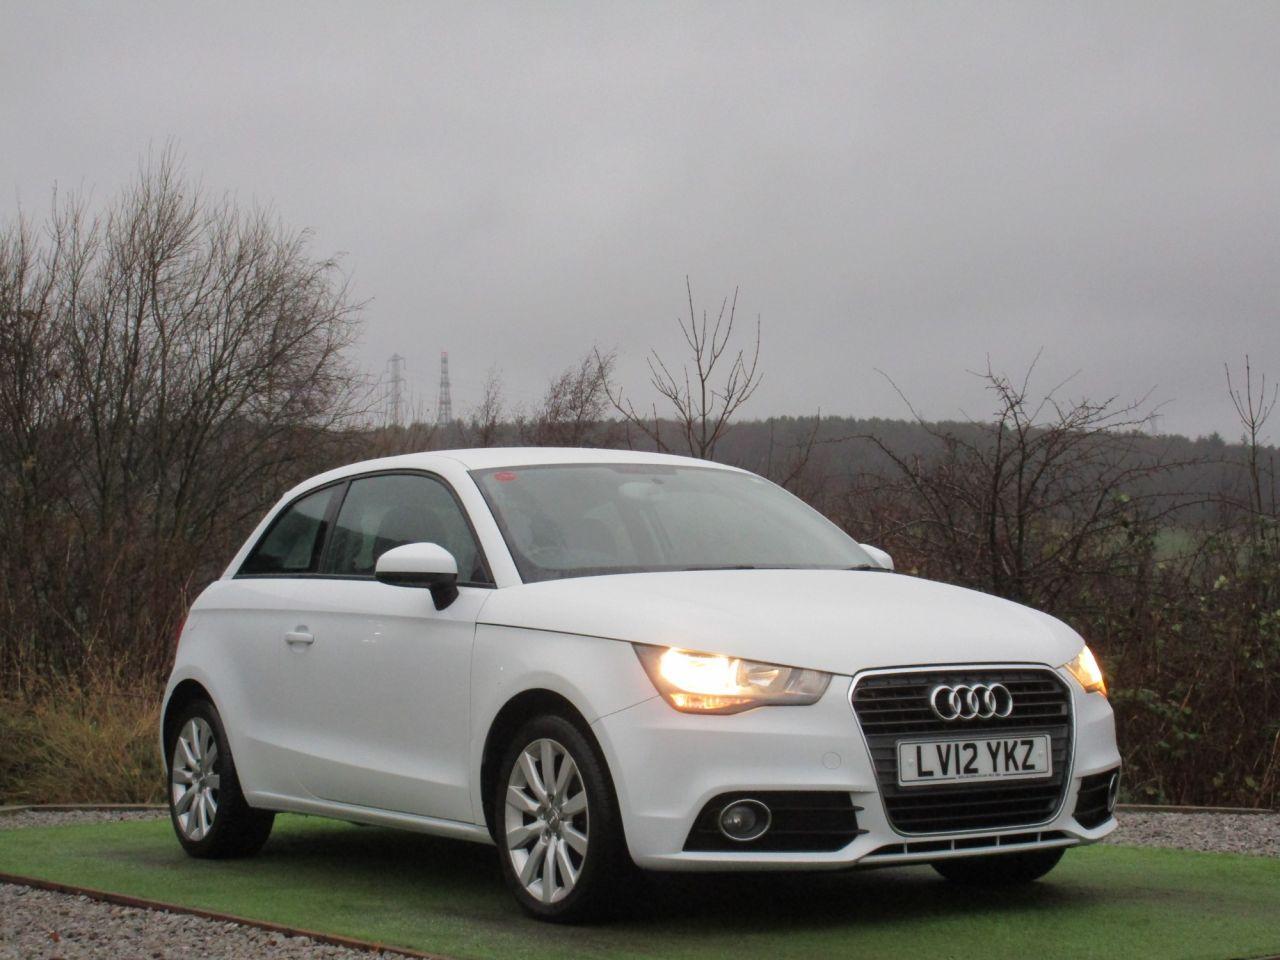 2012 Audi A1 Tfsi Sport £7,490